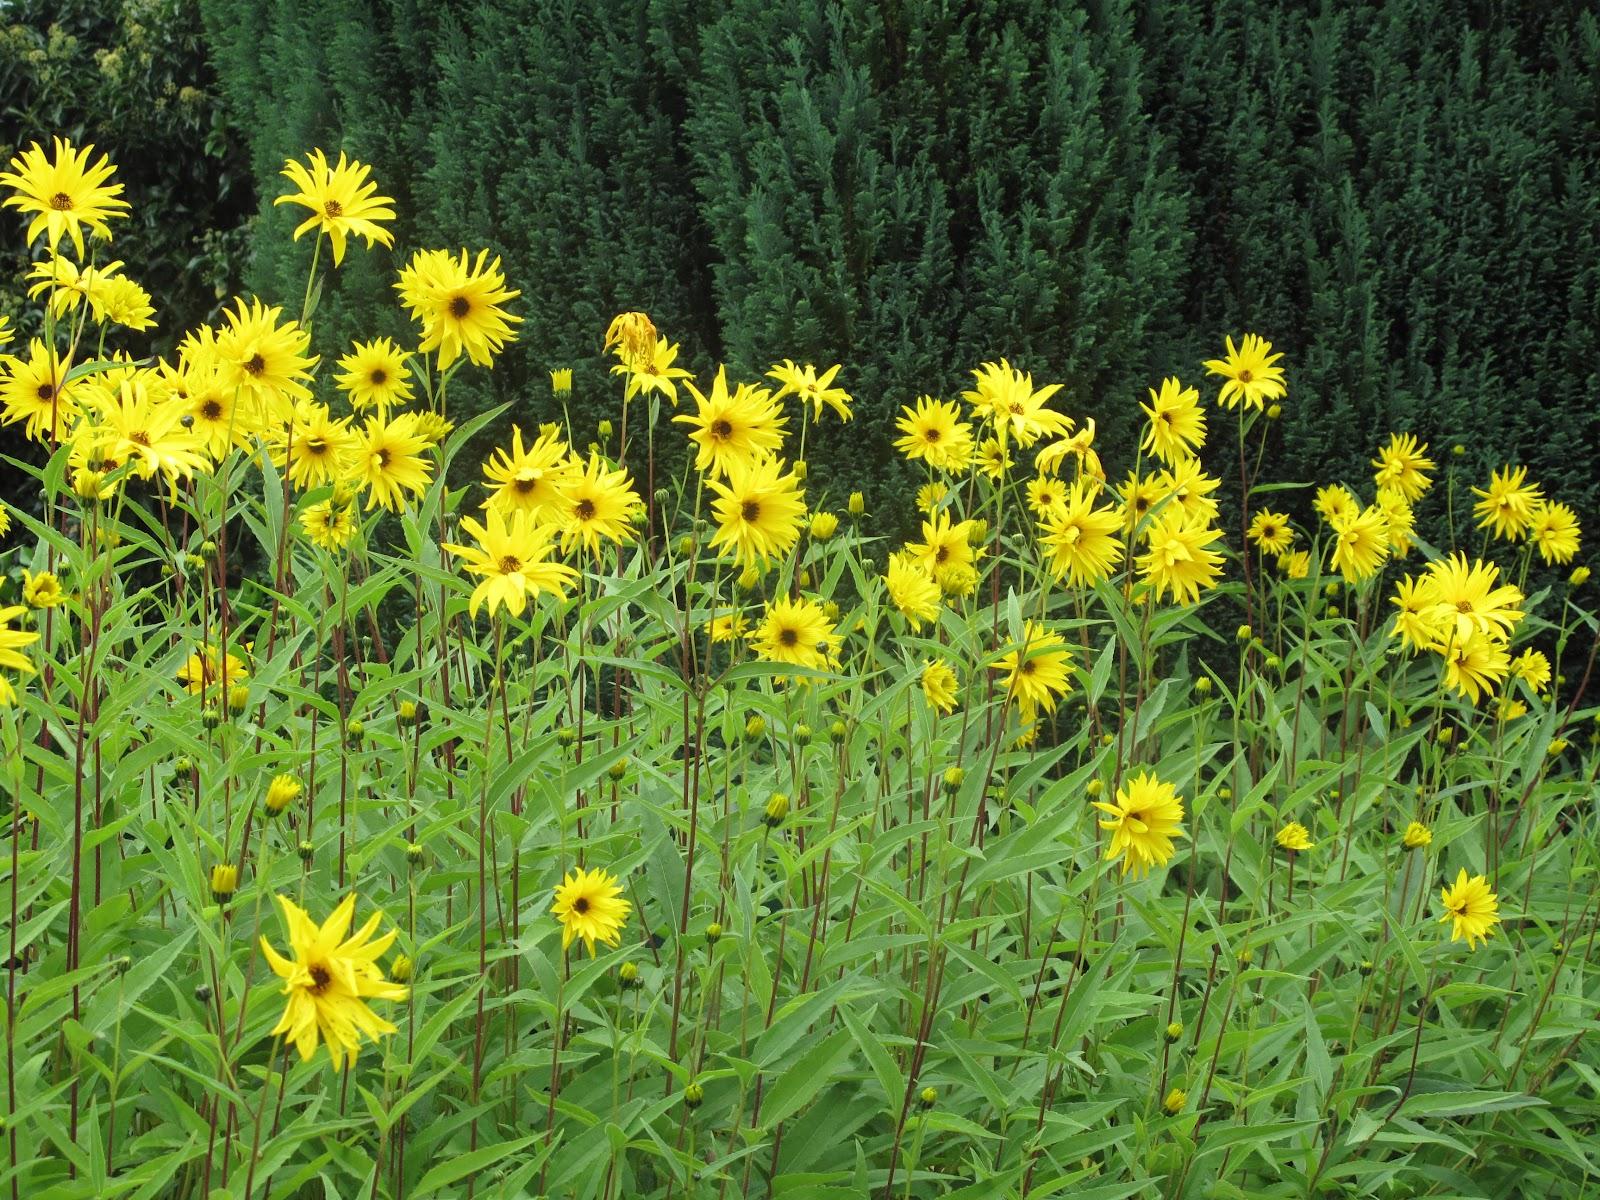 Very Tall Yellow Daisy Like Flower